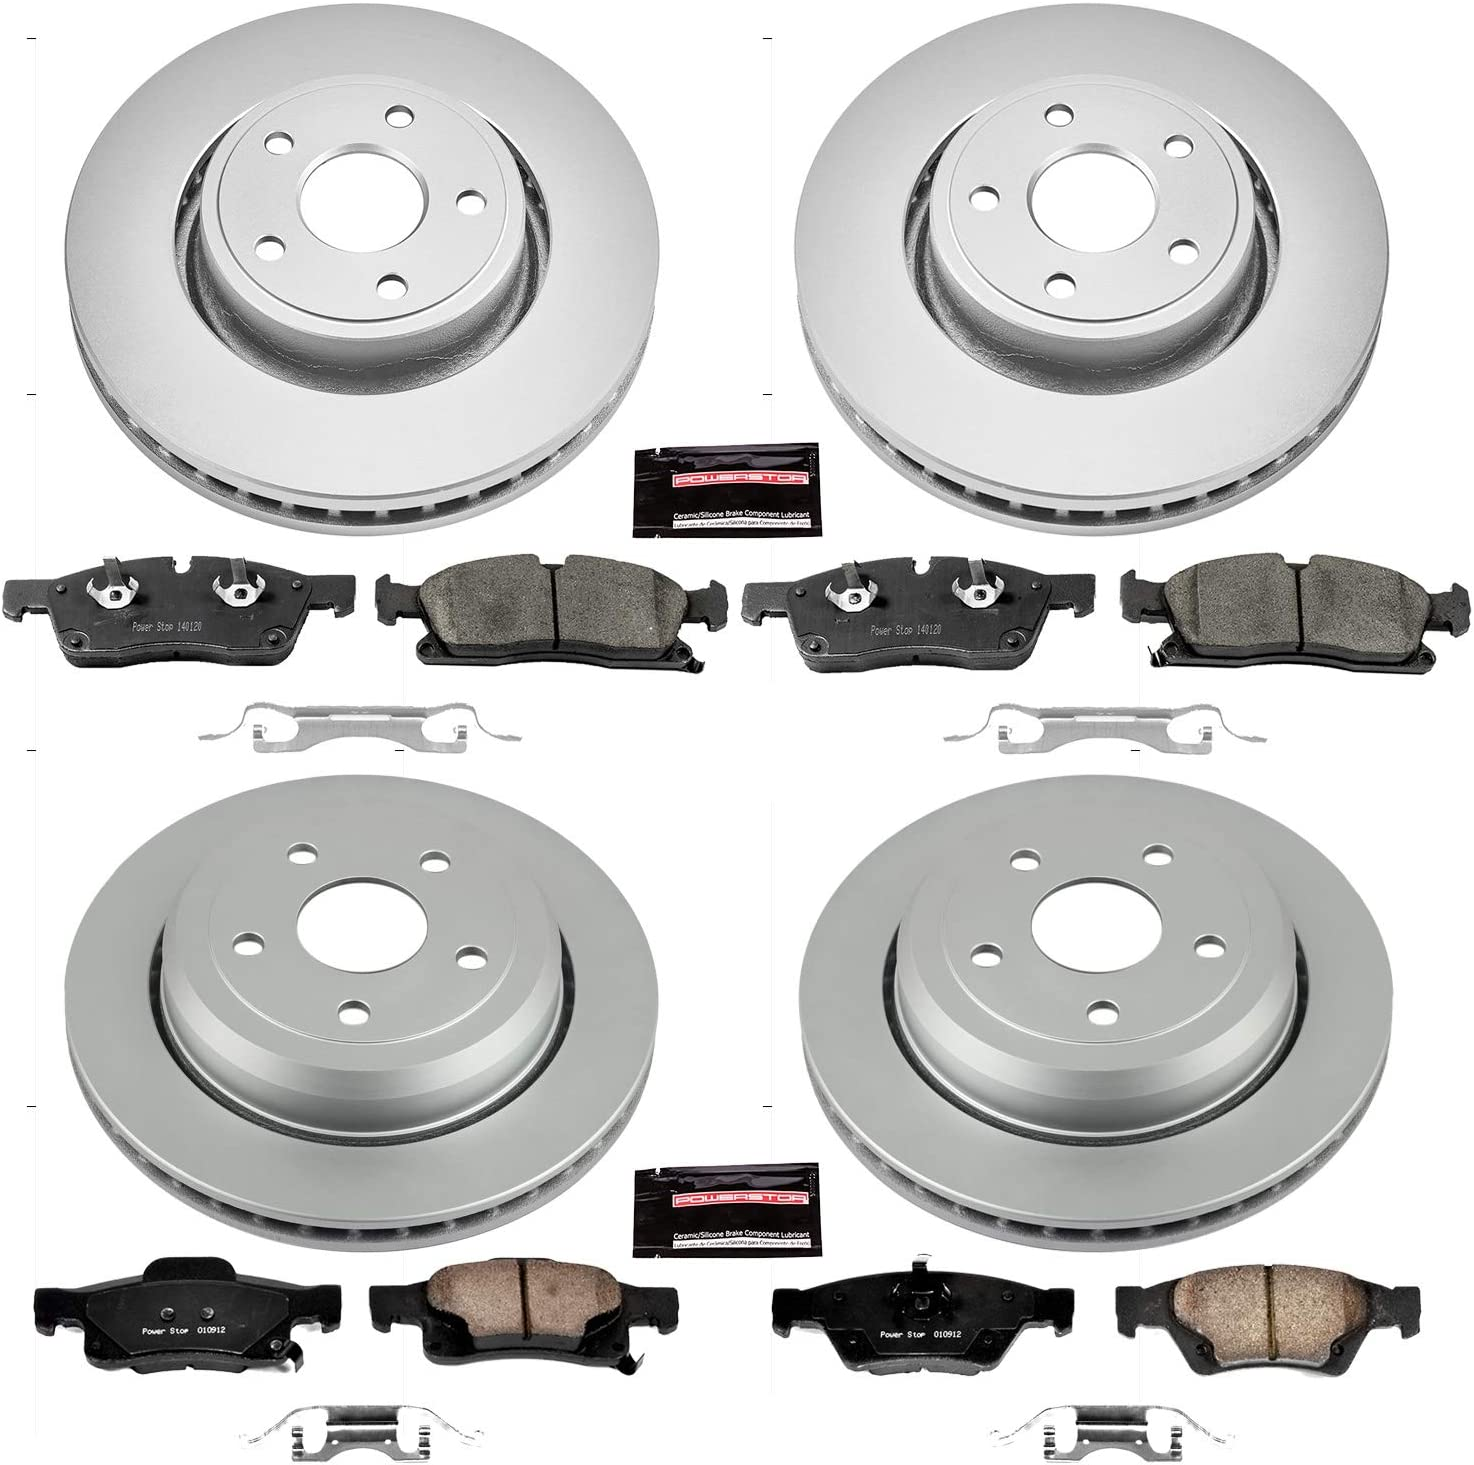 Power Stop CRK5507 front Z17 Evolution Geomet Coated Brake Kit